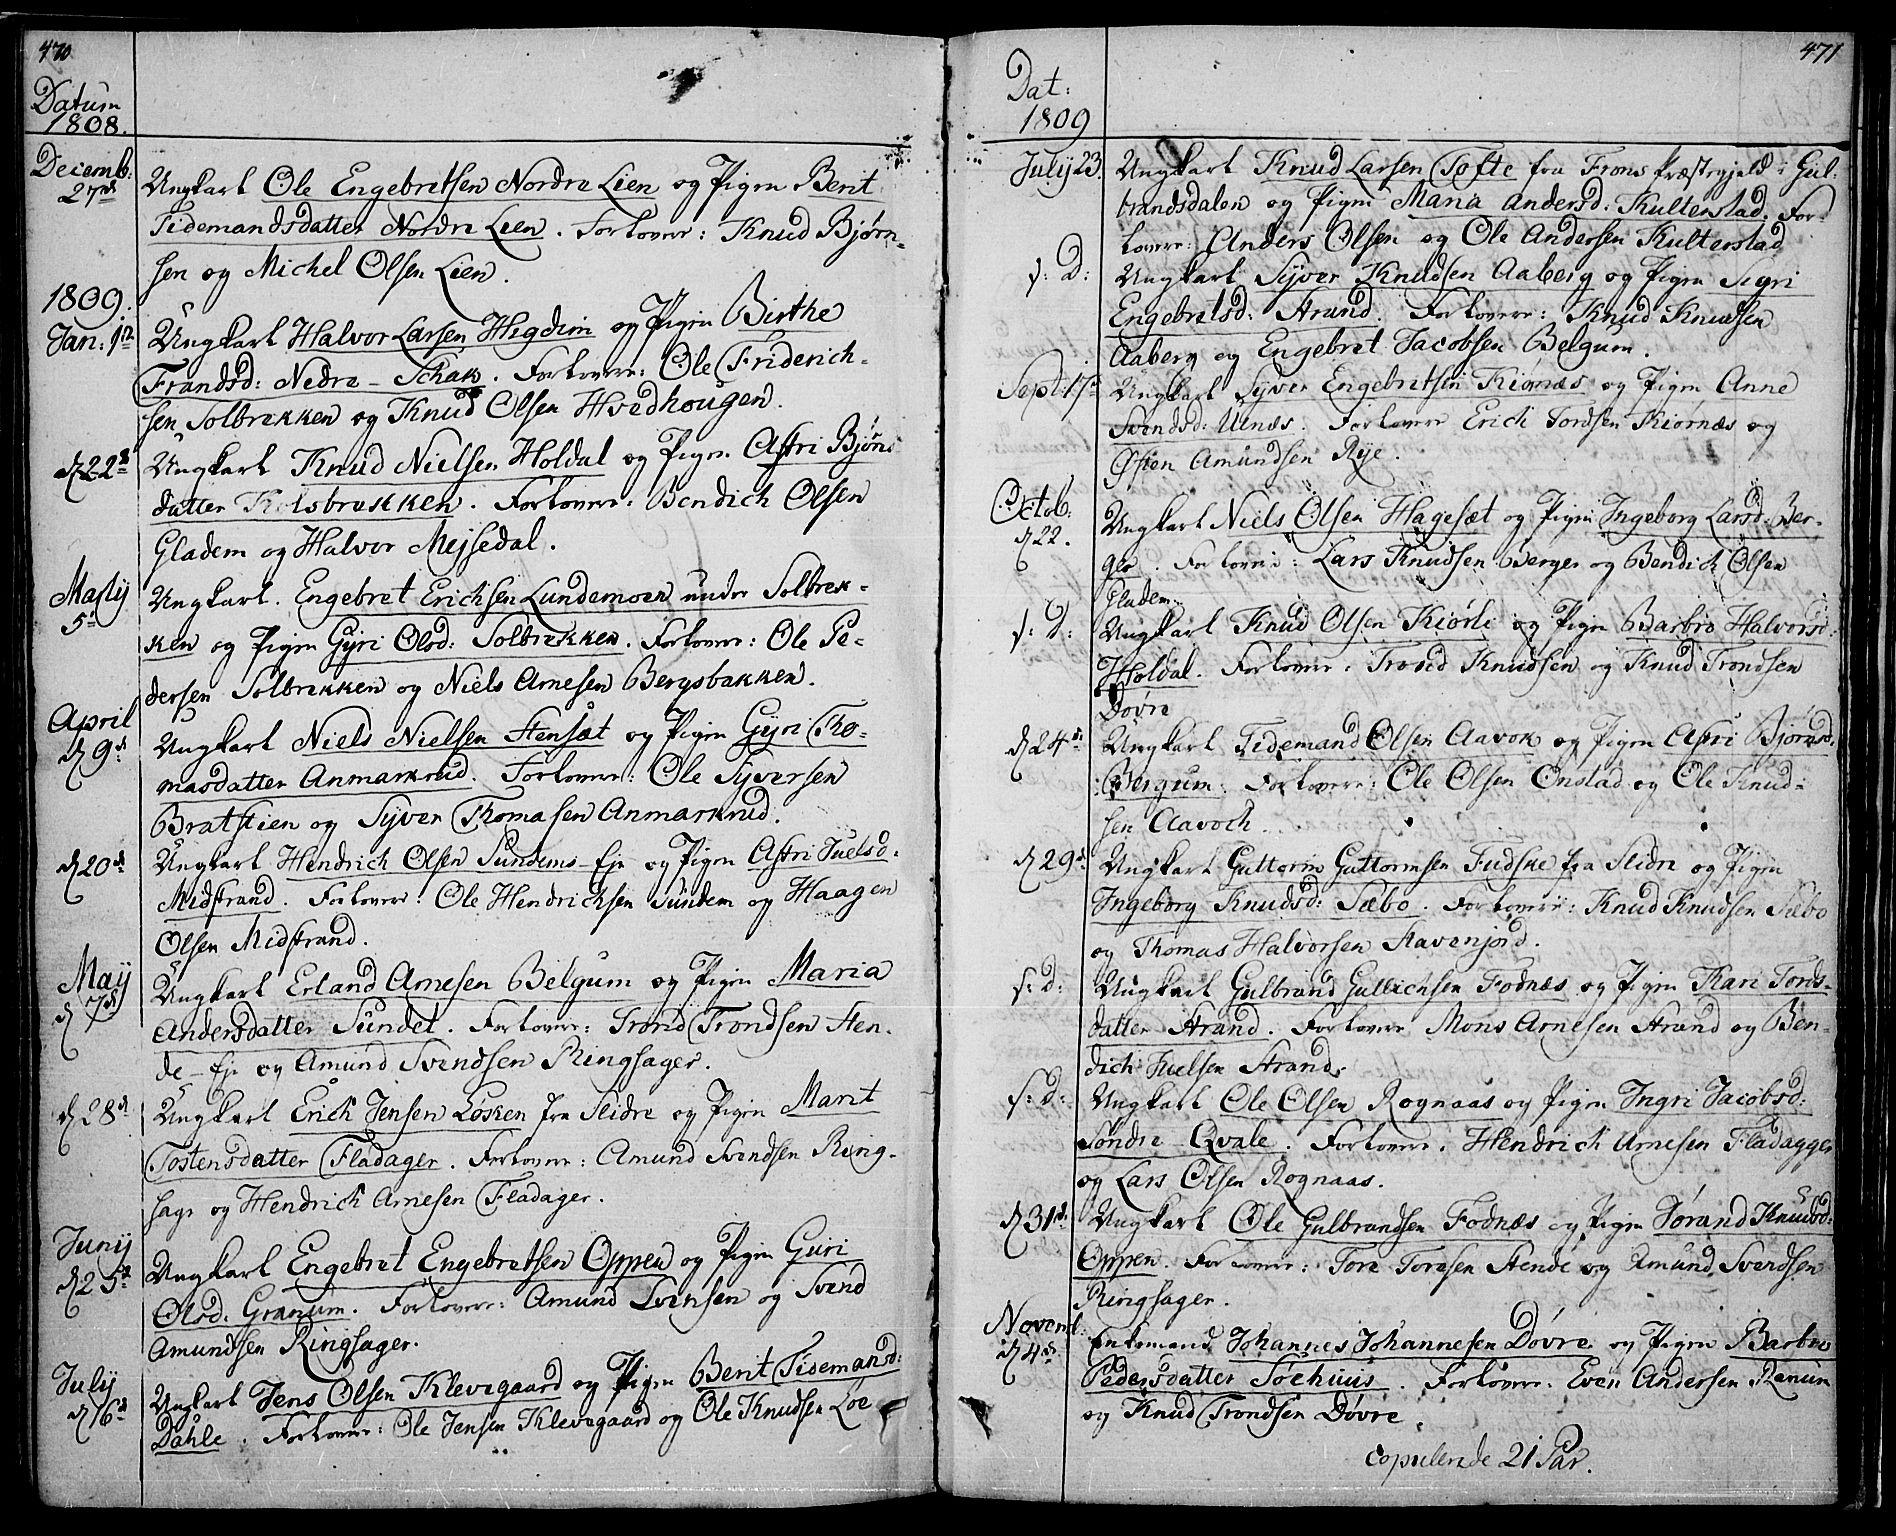 SAH, Nord-Aurdal prestekontor, Ministerialbok nr. 1, 1808-1815, s. 470-471